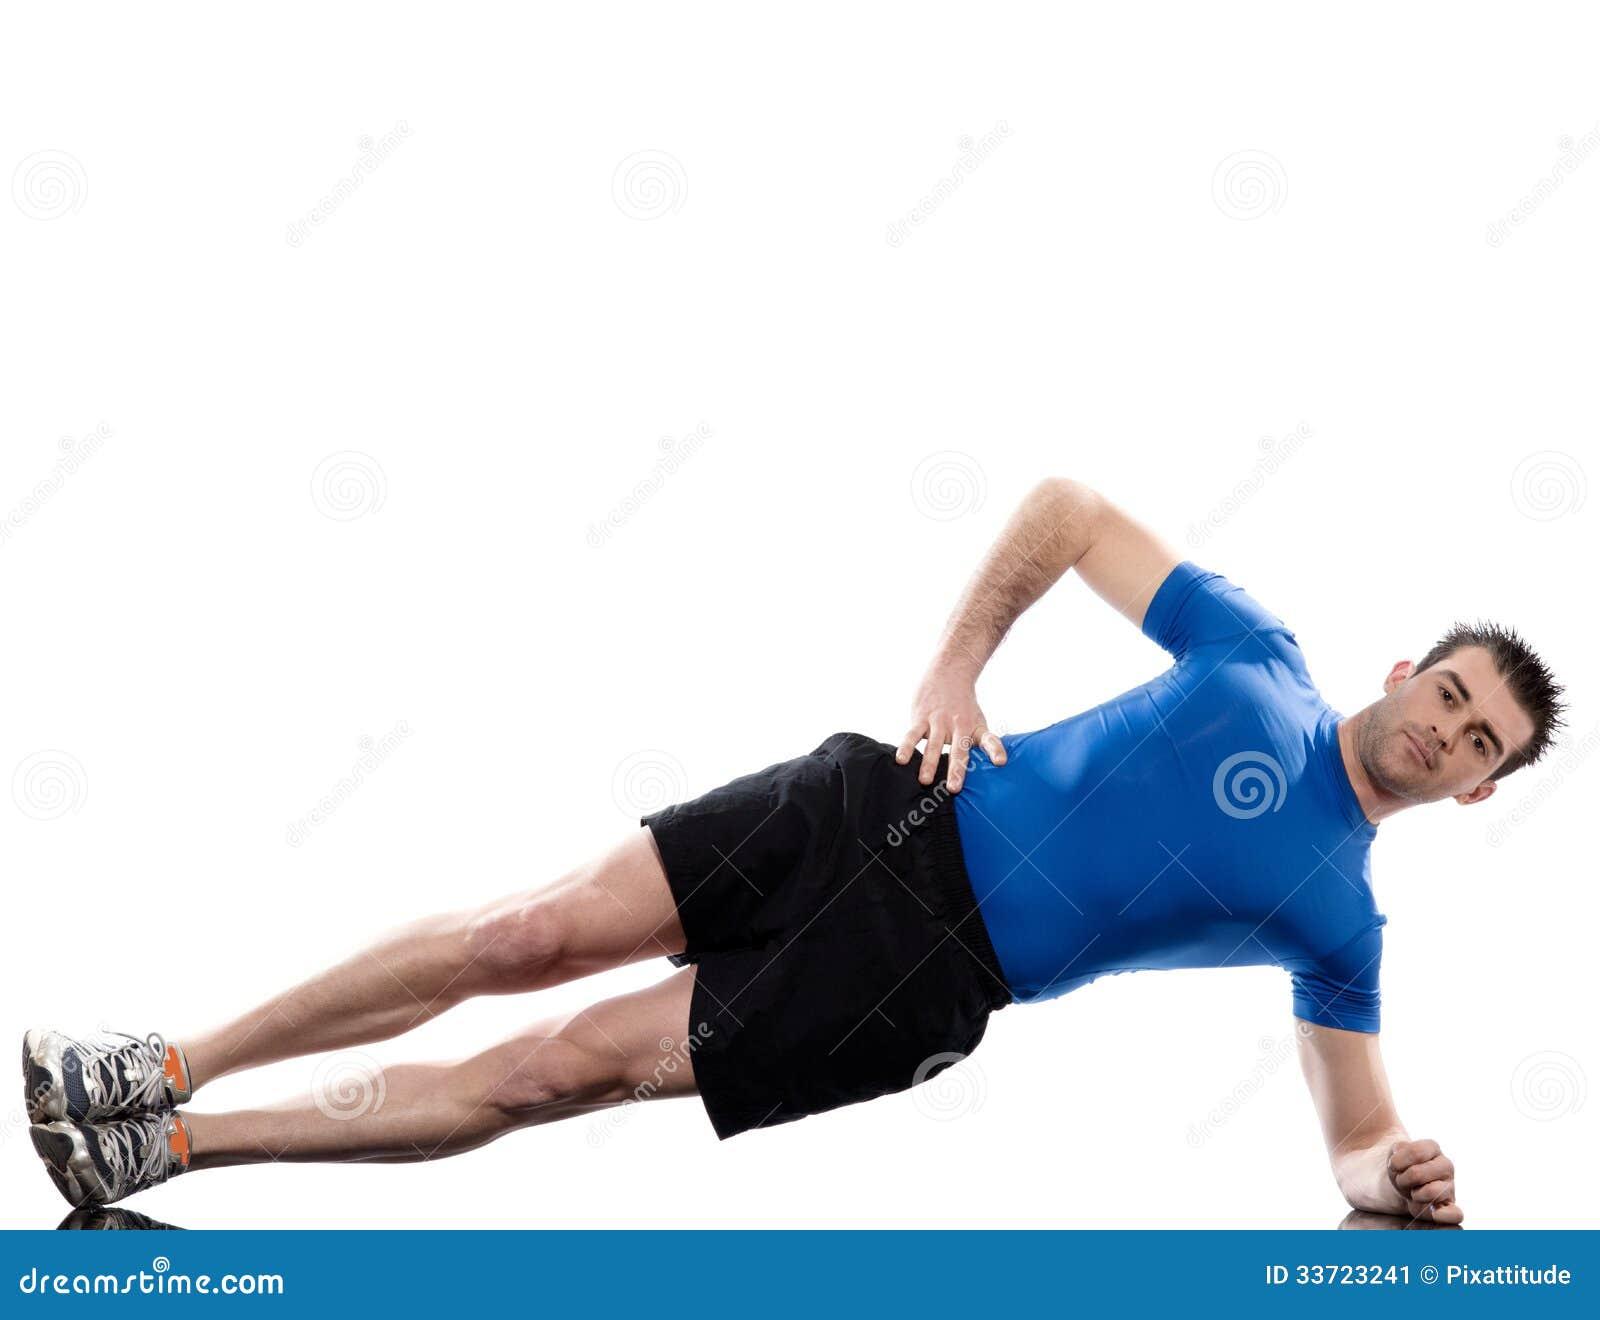 Man Exercising Workout Fitness Posture Abdominals Push Ups ...